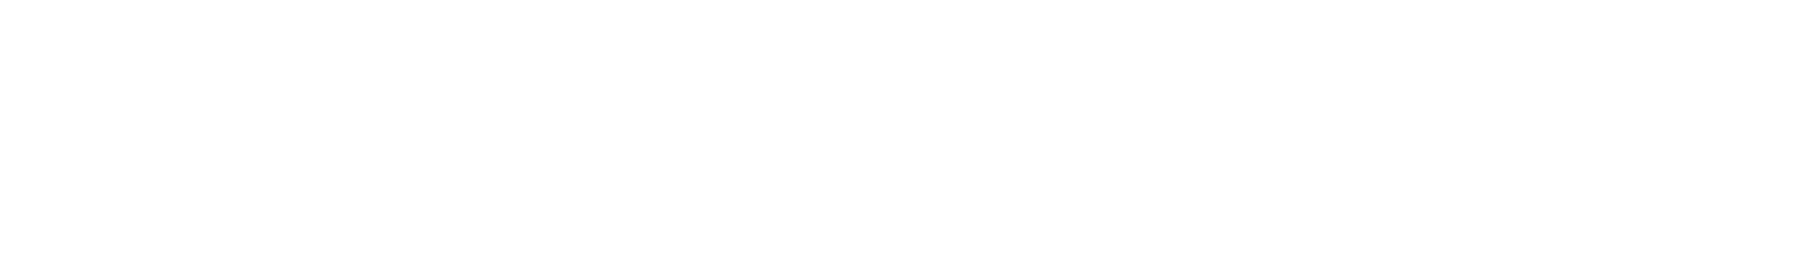 ct2 120 fm mono synth roger